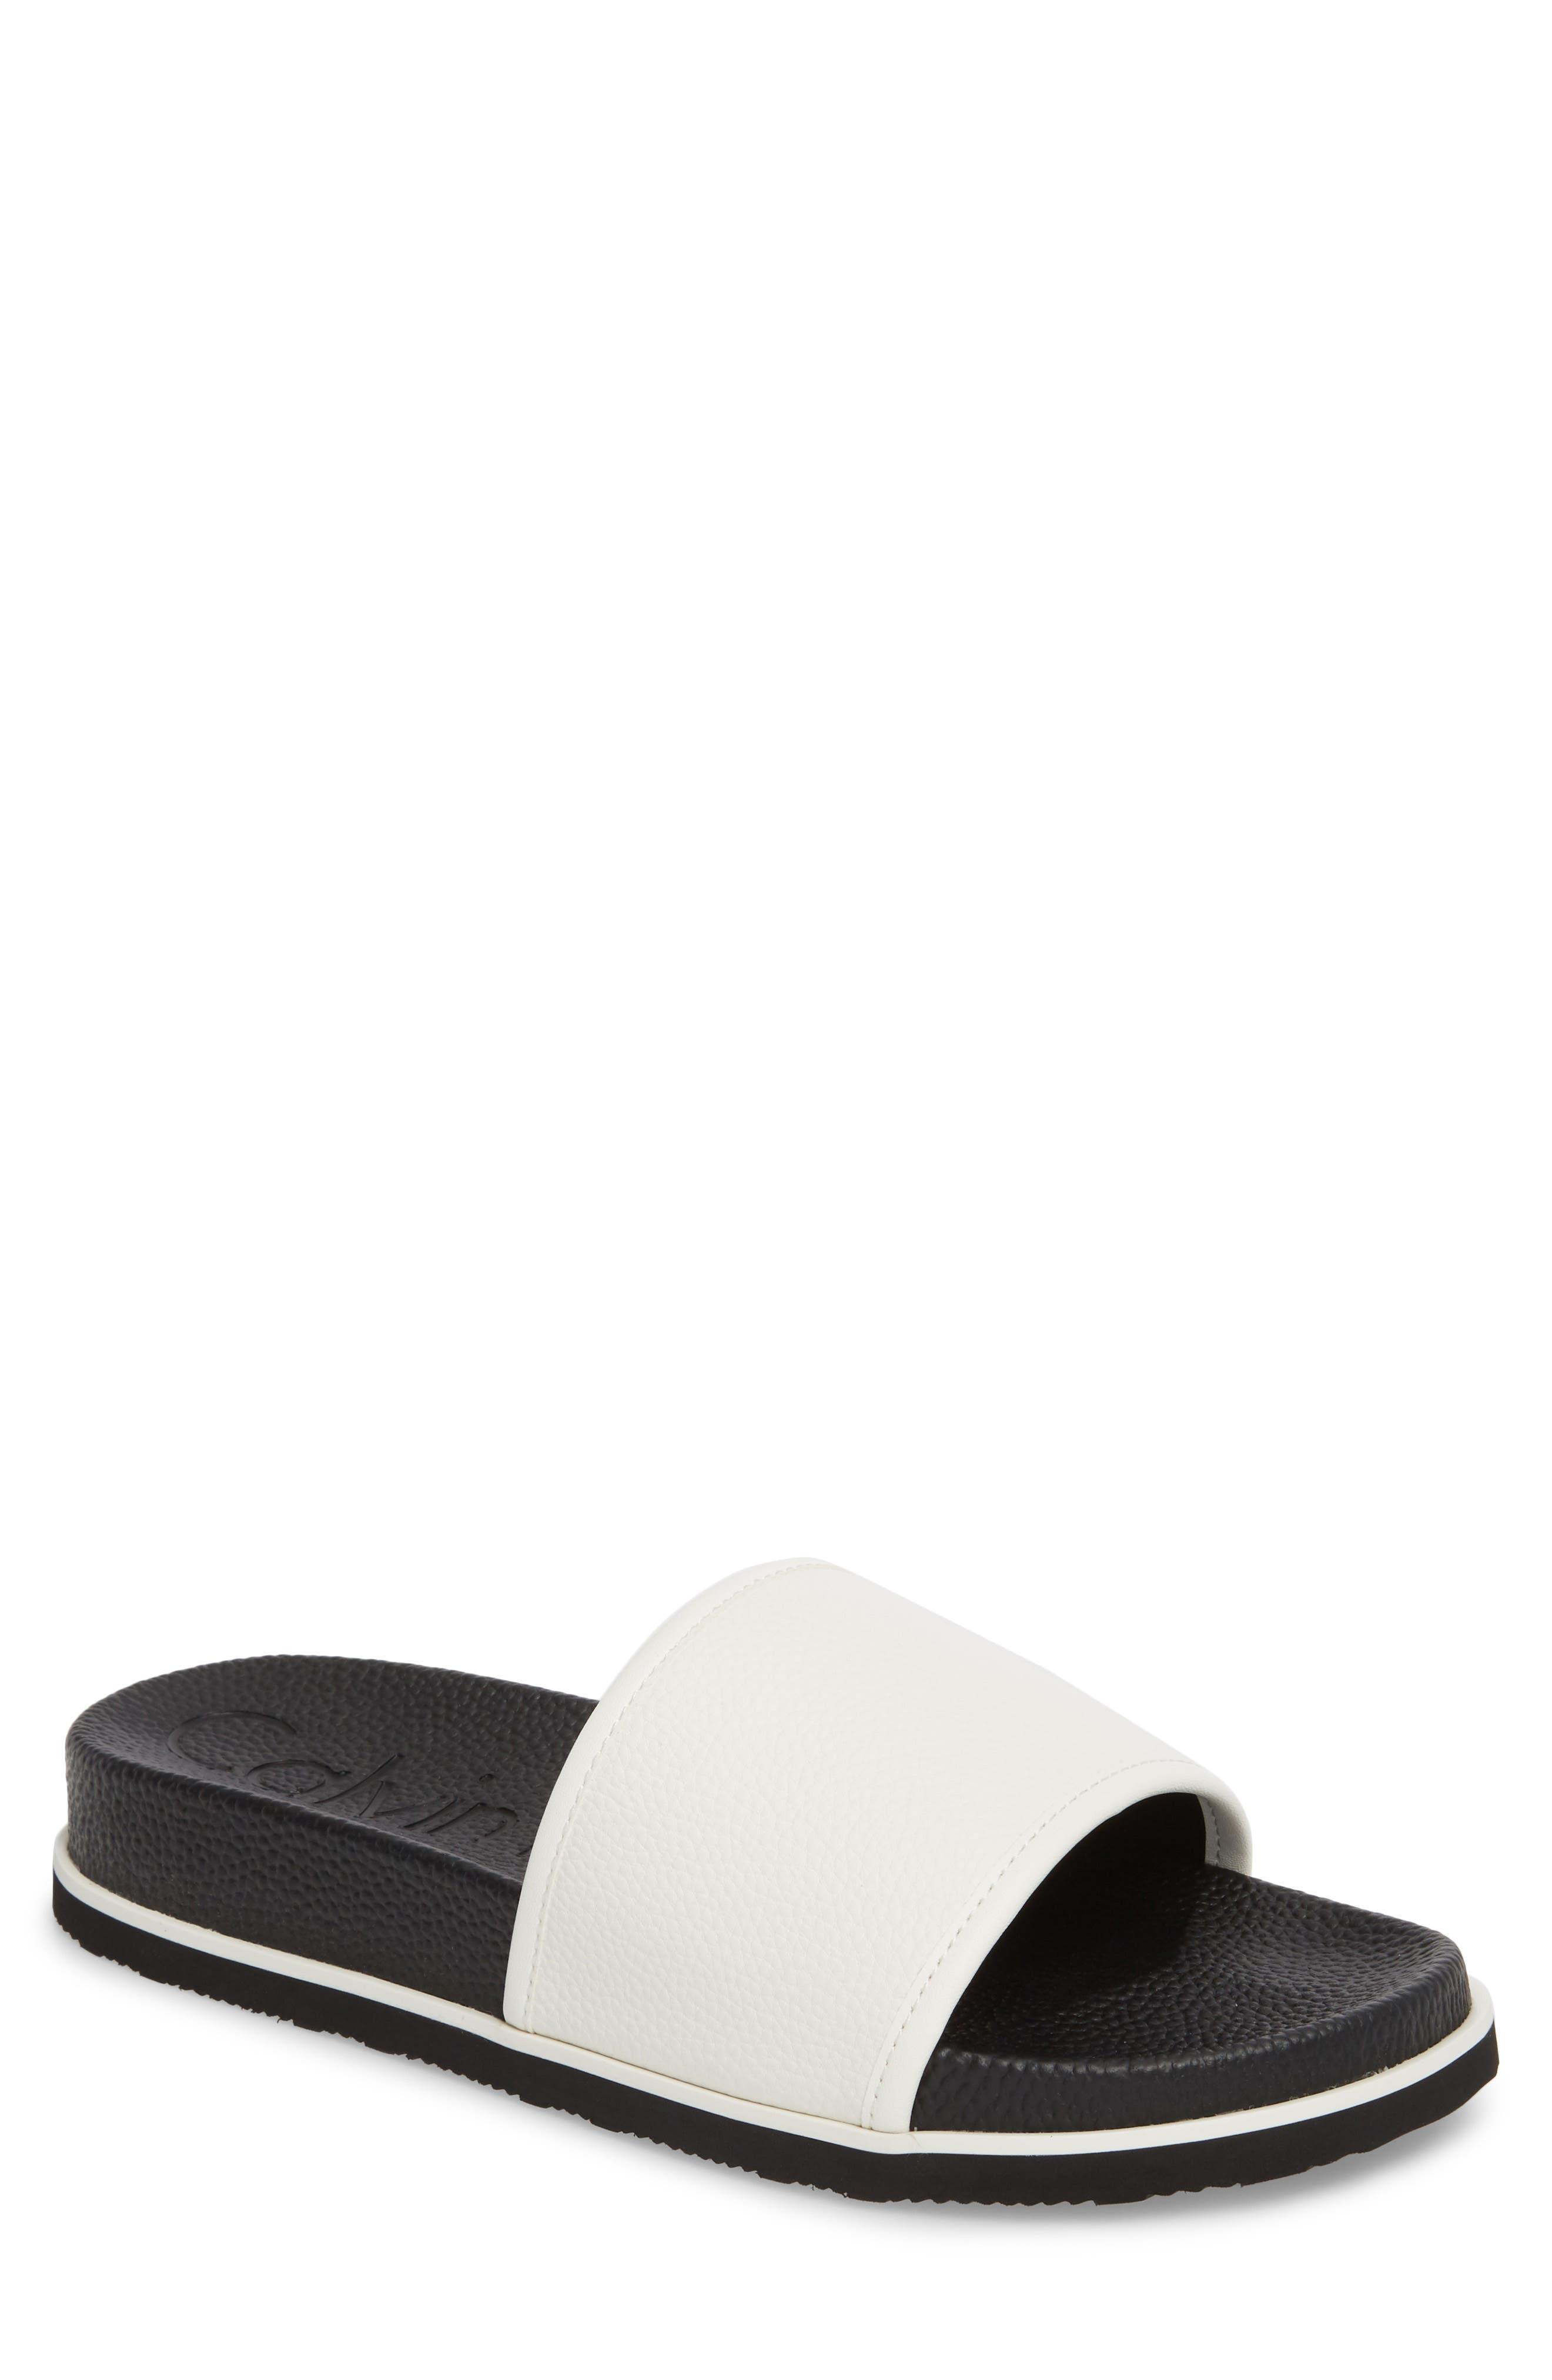 Mackee Sport Slide,                         Main,                         color, White Leather